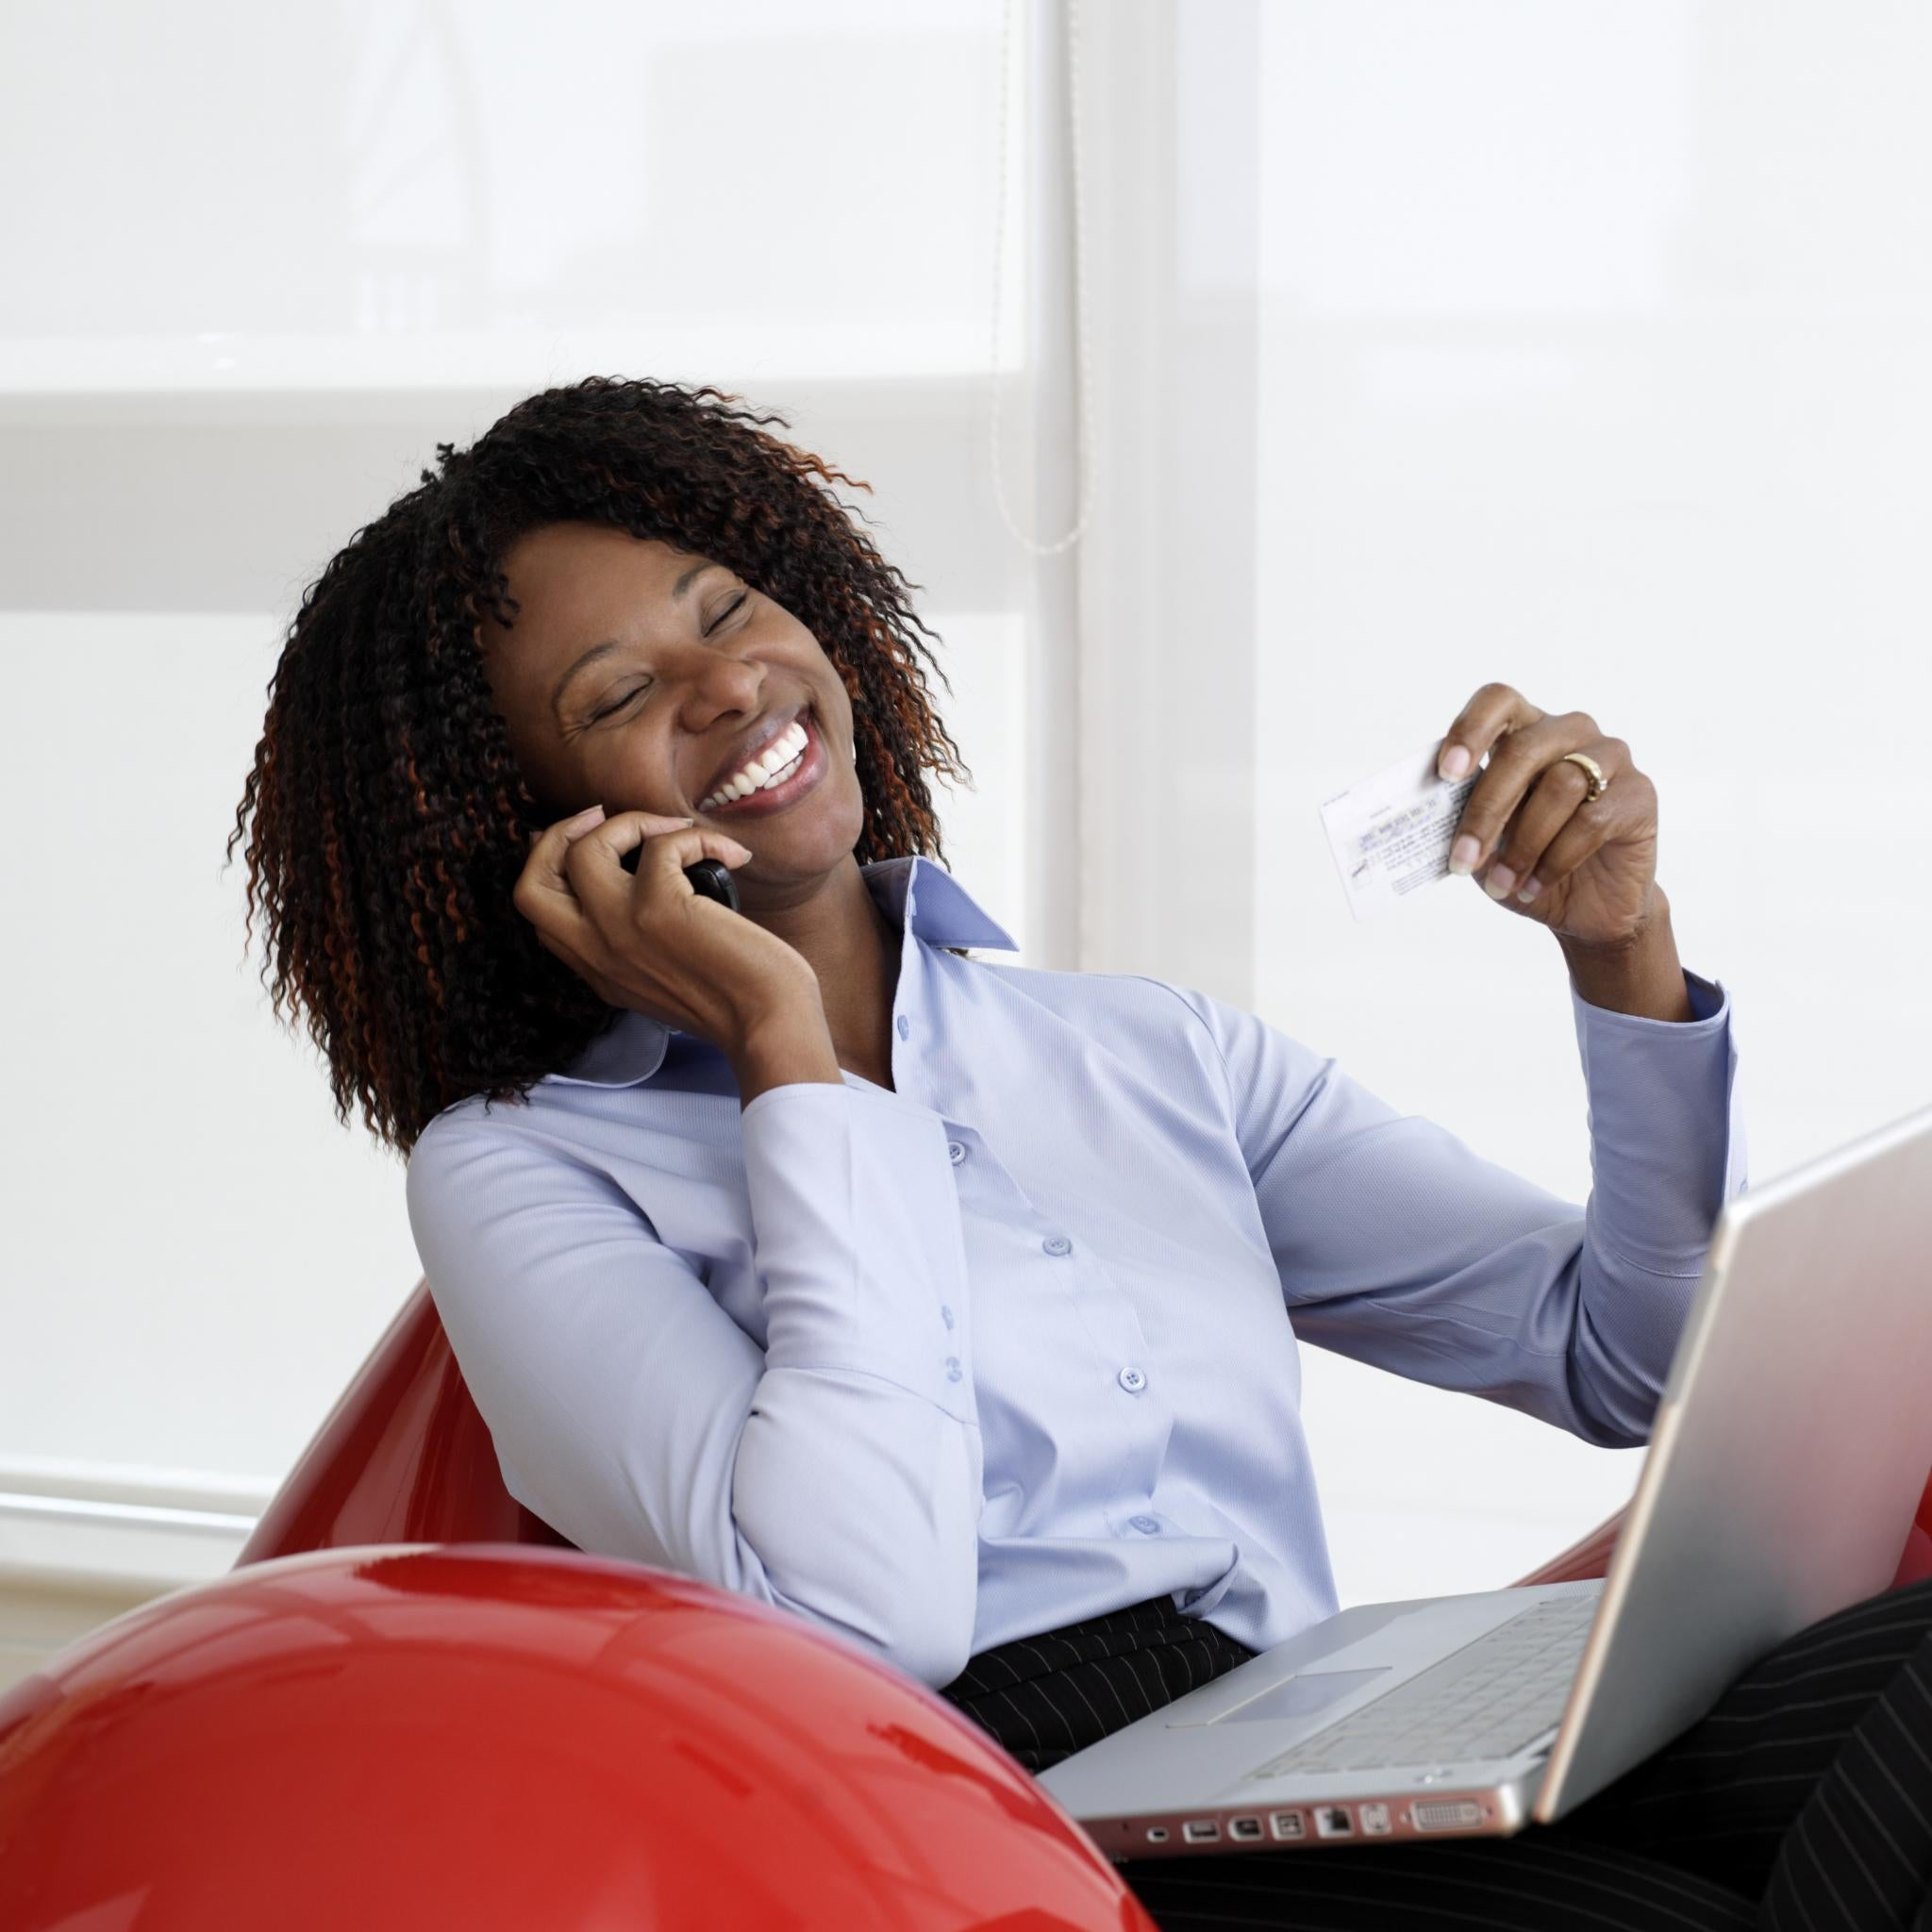 woman-at-work.jpg